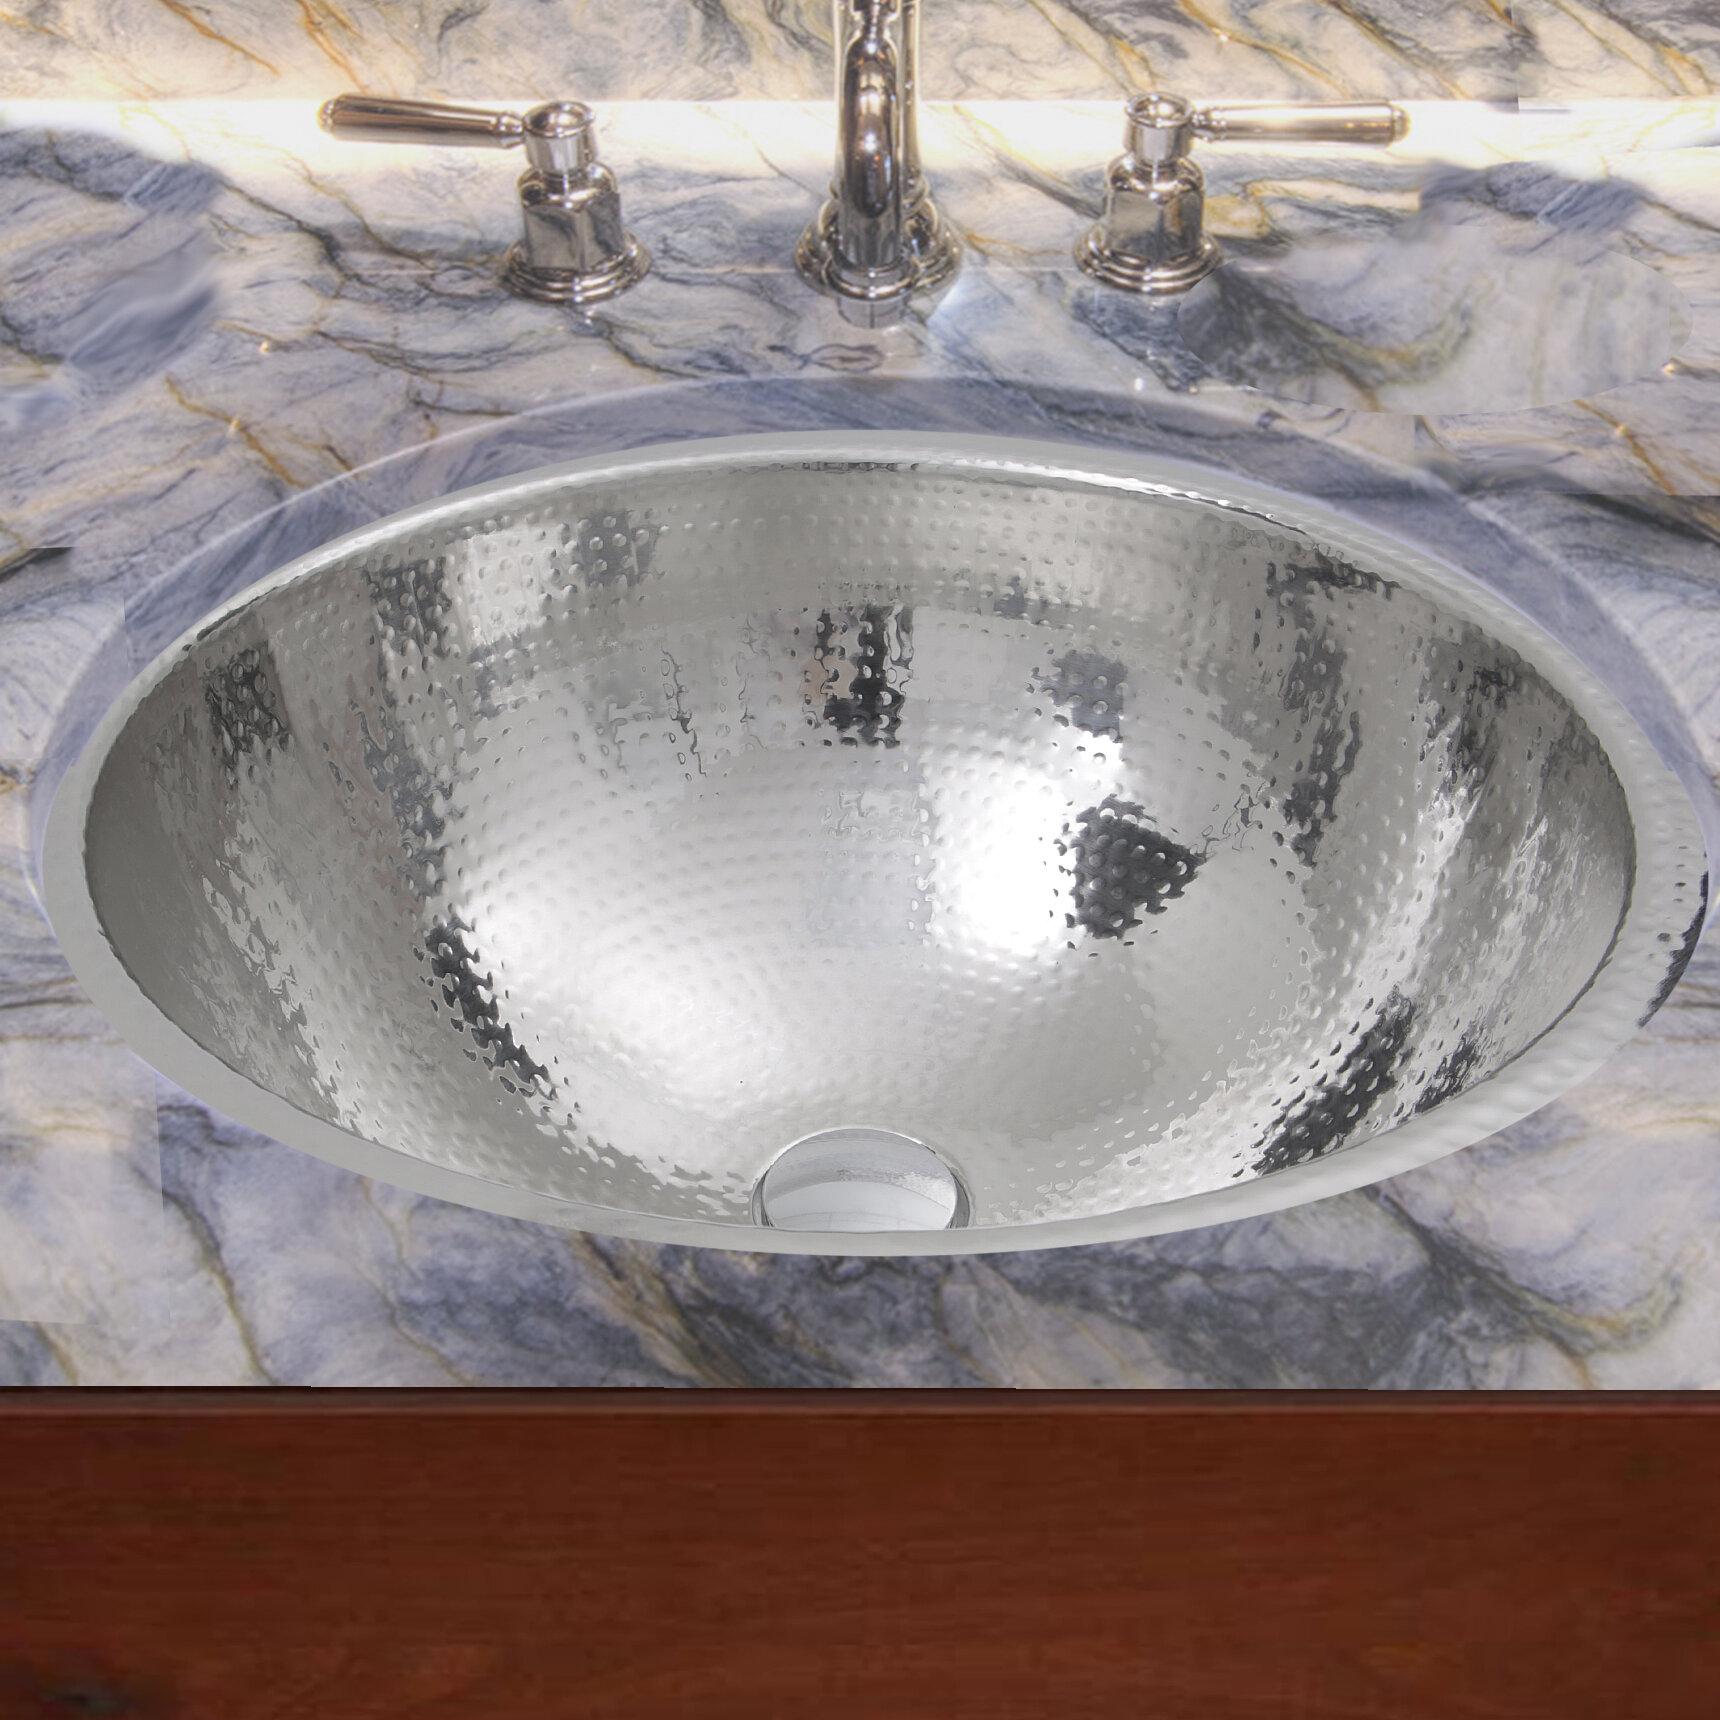 Nantucket Sinks Hand Hammered Stainless Steel Circular Undermount Bathroom Sink With Overflow Wayfair